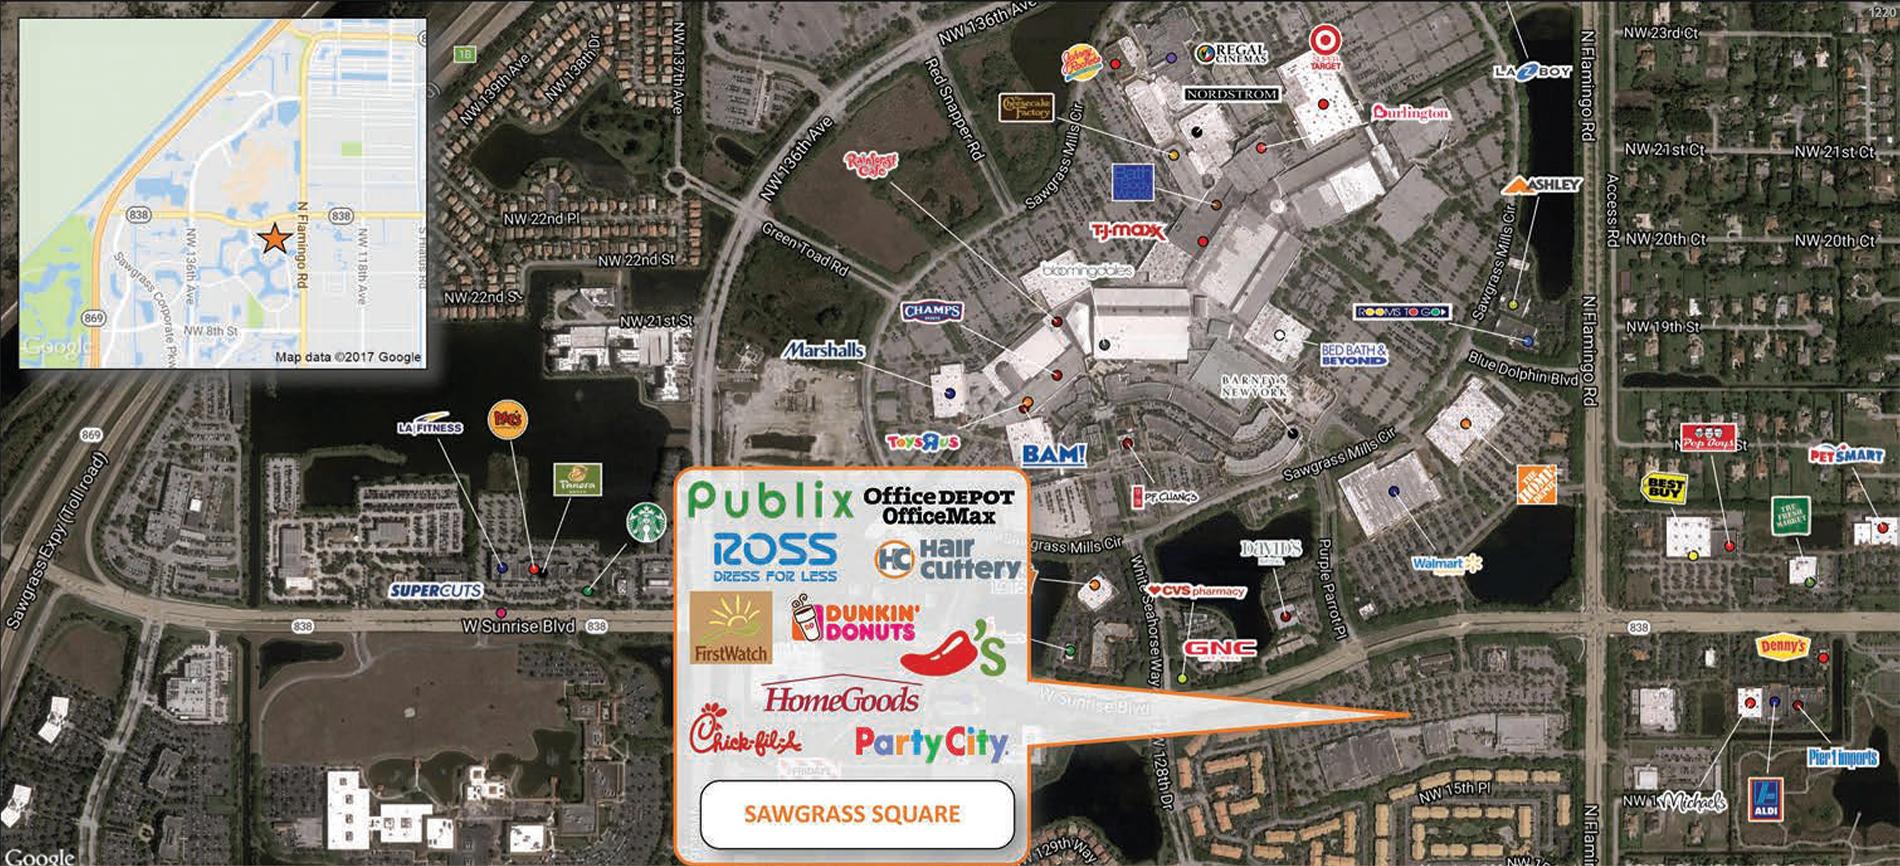 Sawgrass Square trade area map